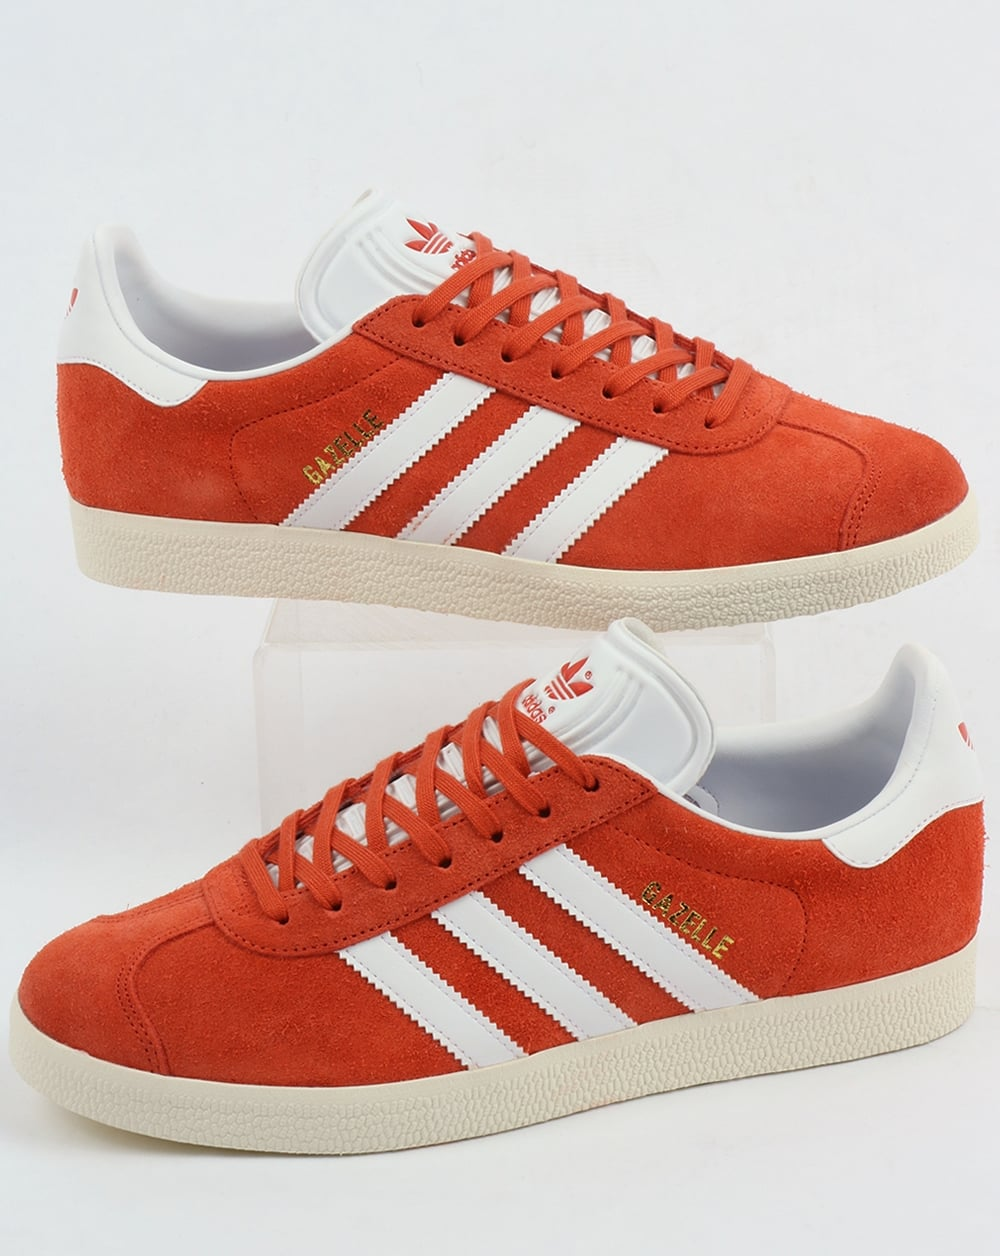 adidas gazelle trainers future harvest white originals shoes orange mens. Black Bedroom Furniture Sets. Home Design Ideas